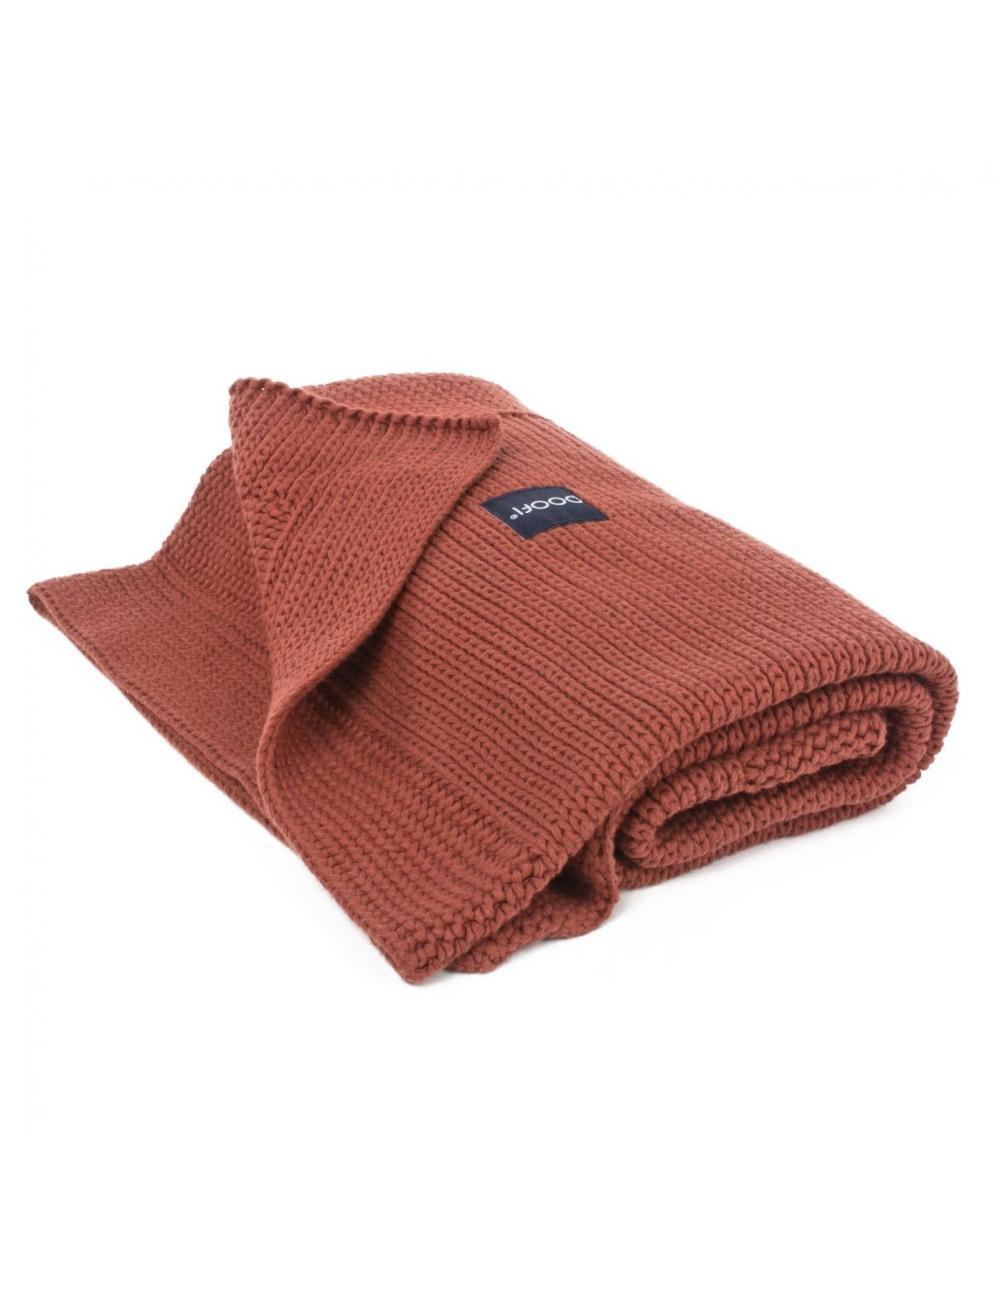 Knitted baby blanket | bricktest